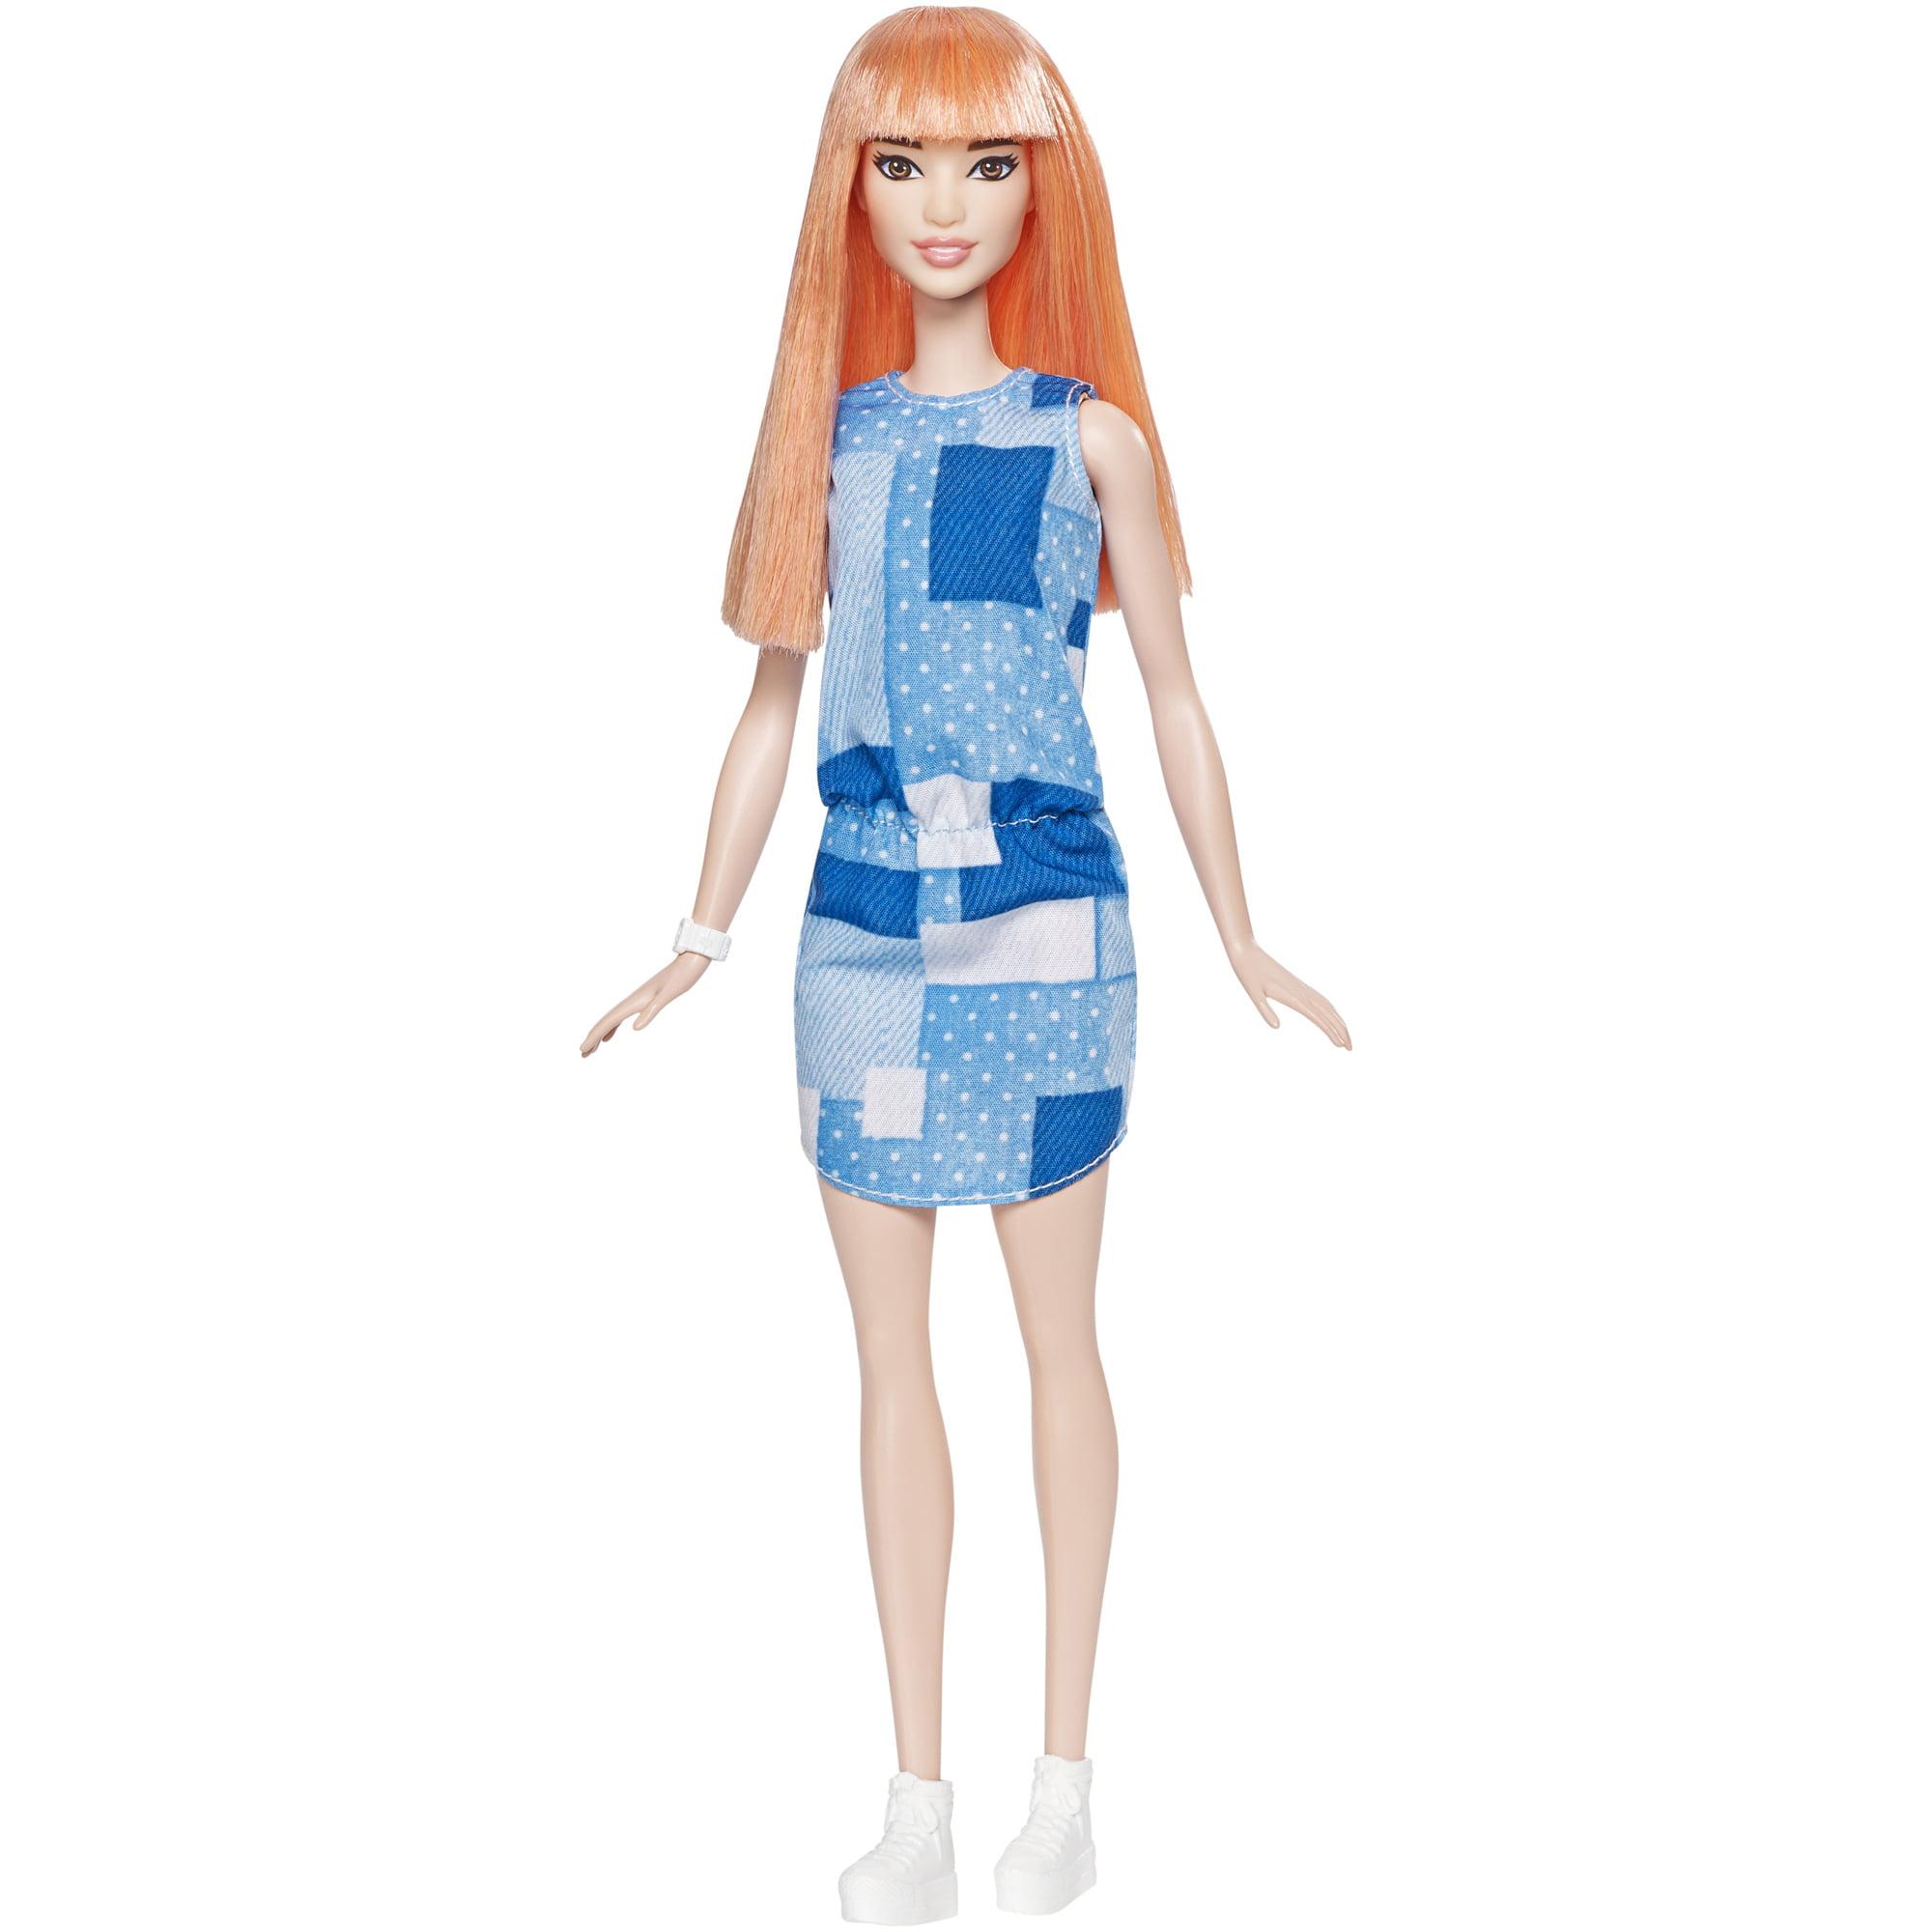 Barbie Fashionistas Original Doll 60 Patchwork Denim